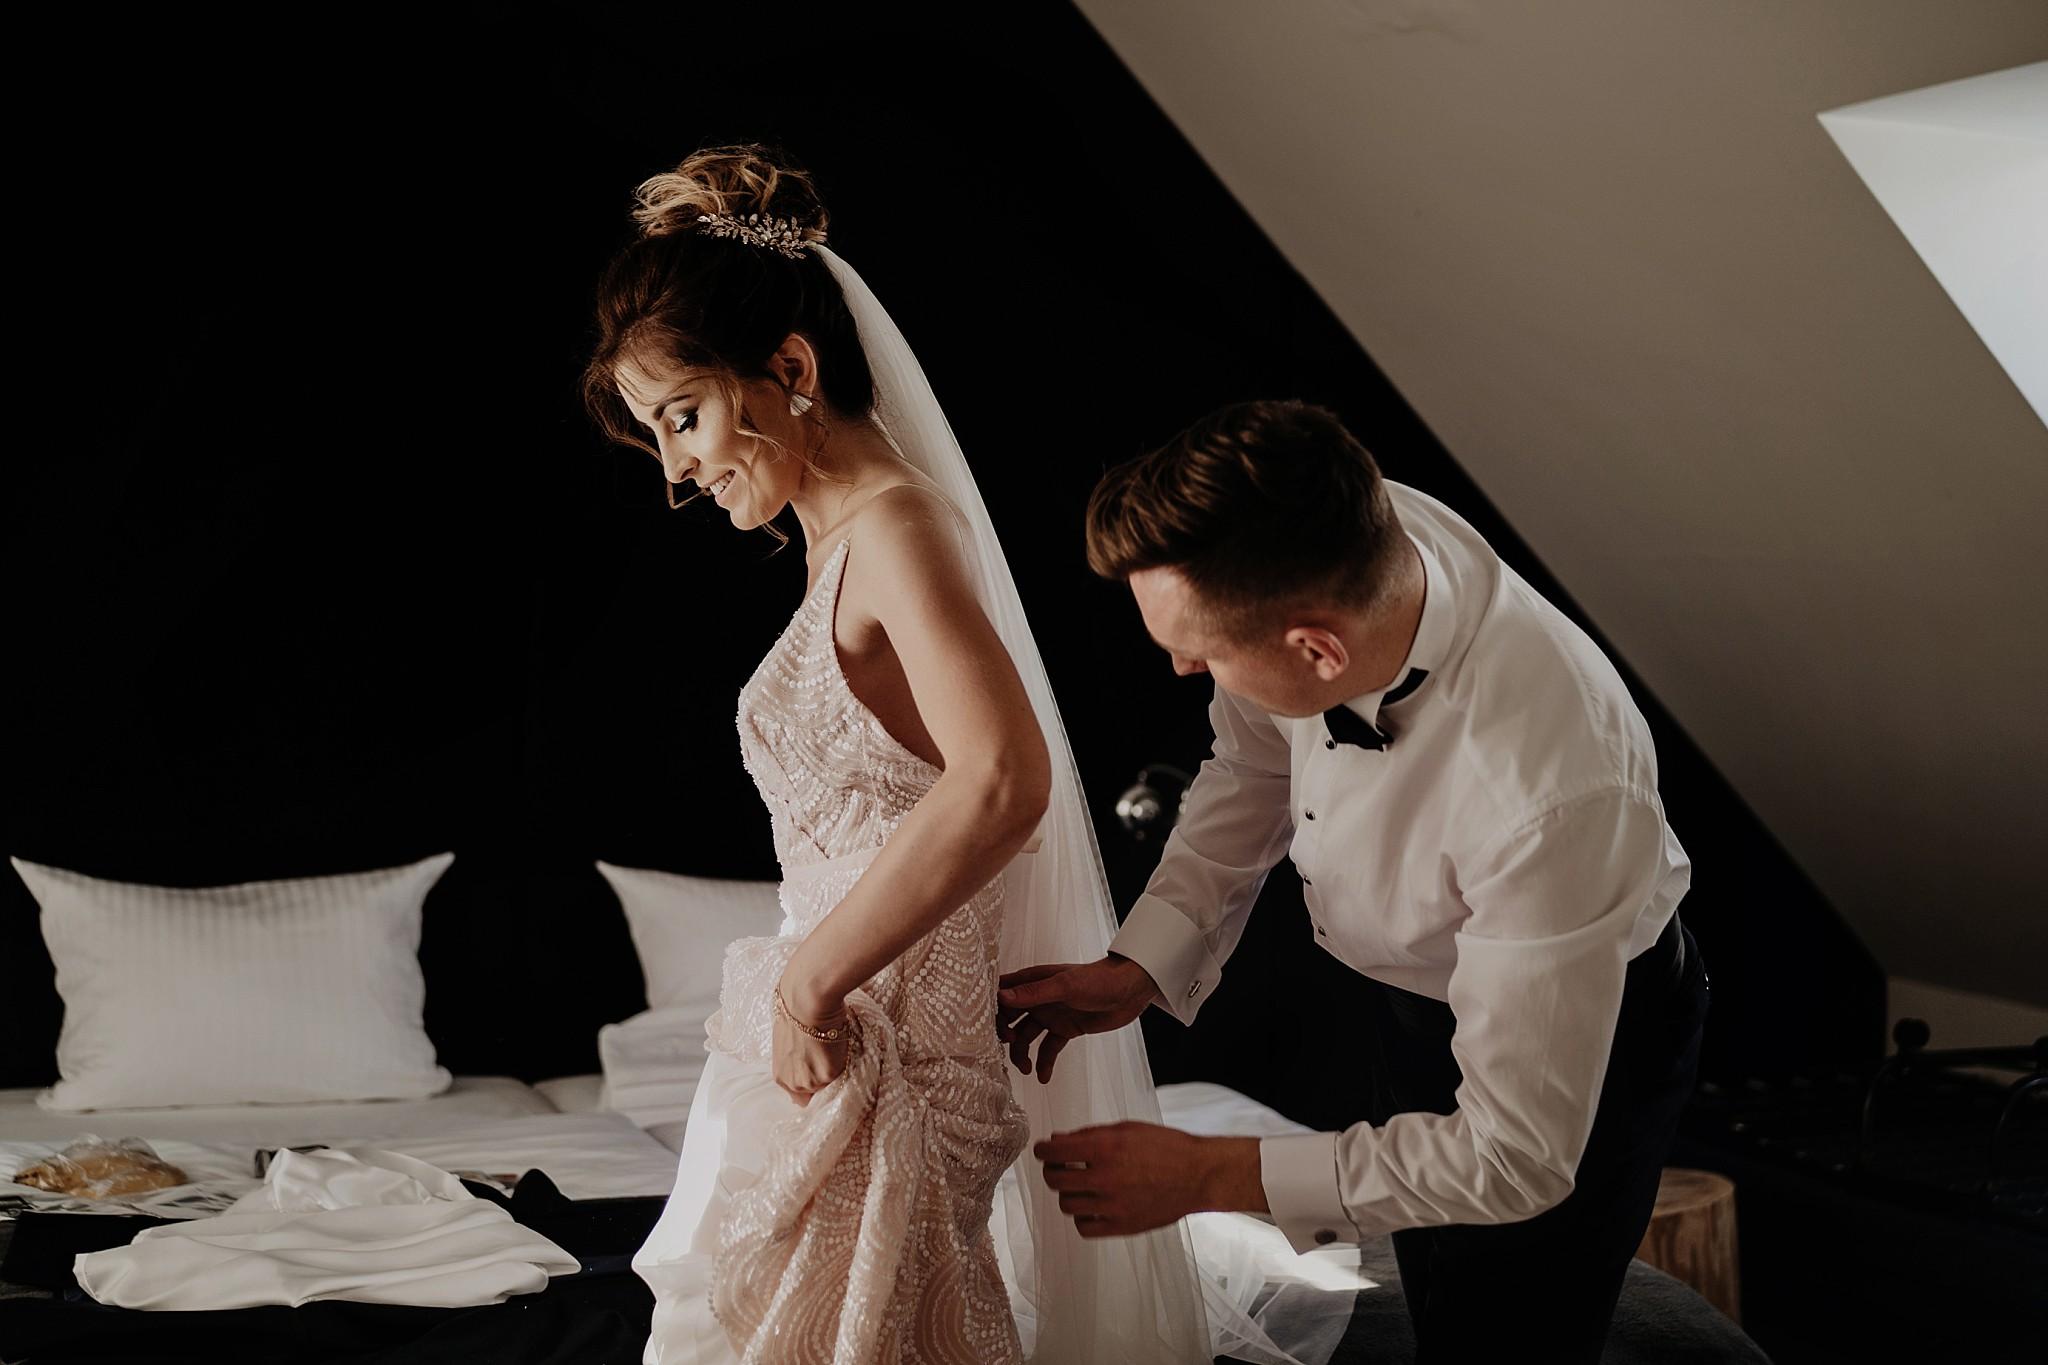 fotograf poznan wesele dobra truskawka piekne wesele pod poznaniem wesele w dobrej truskawce piekna para mloda slub marzen slub koronawirus slub listopad wesele koronawirus 072